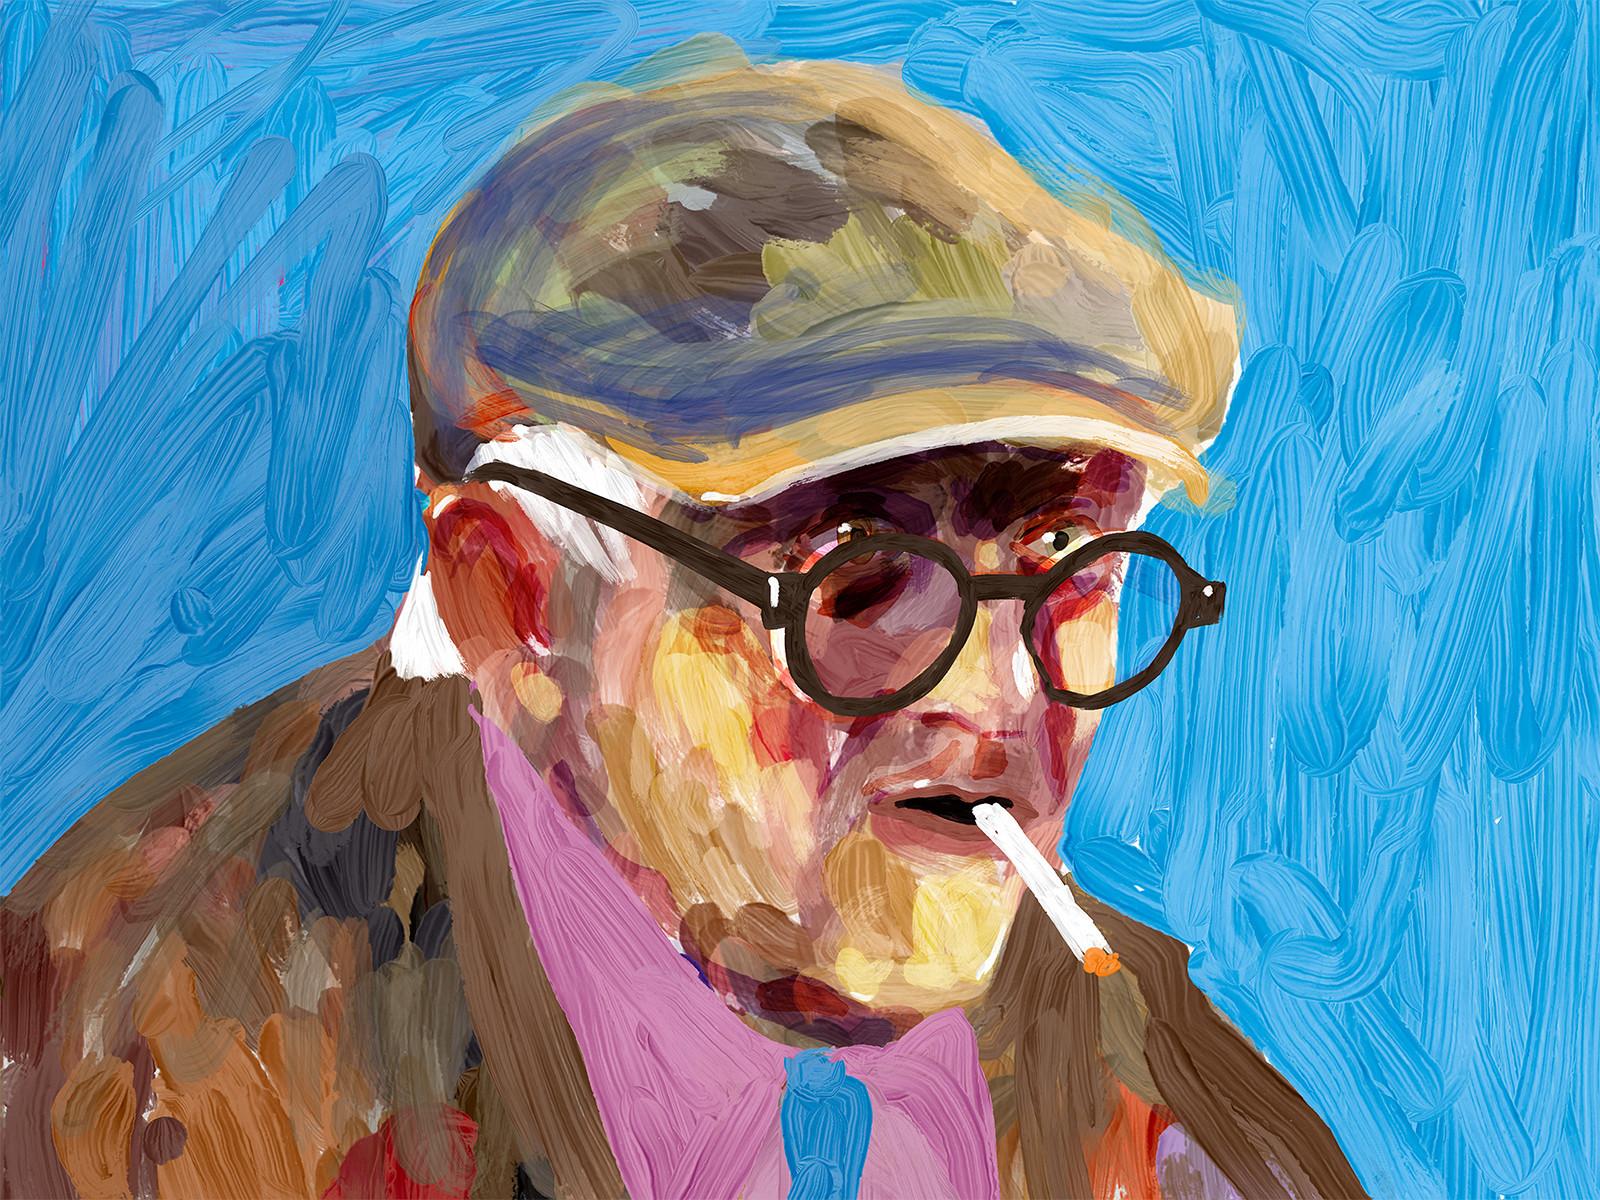 The Yorkshire Artist